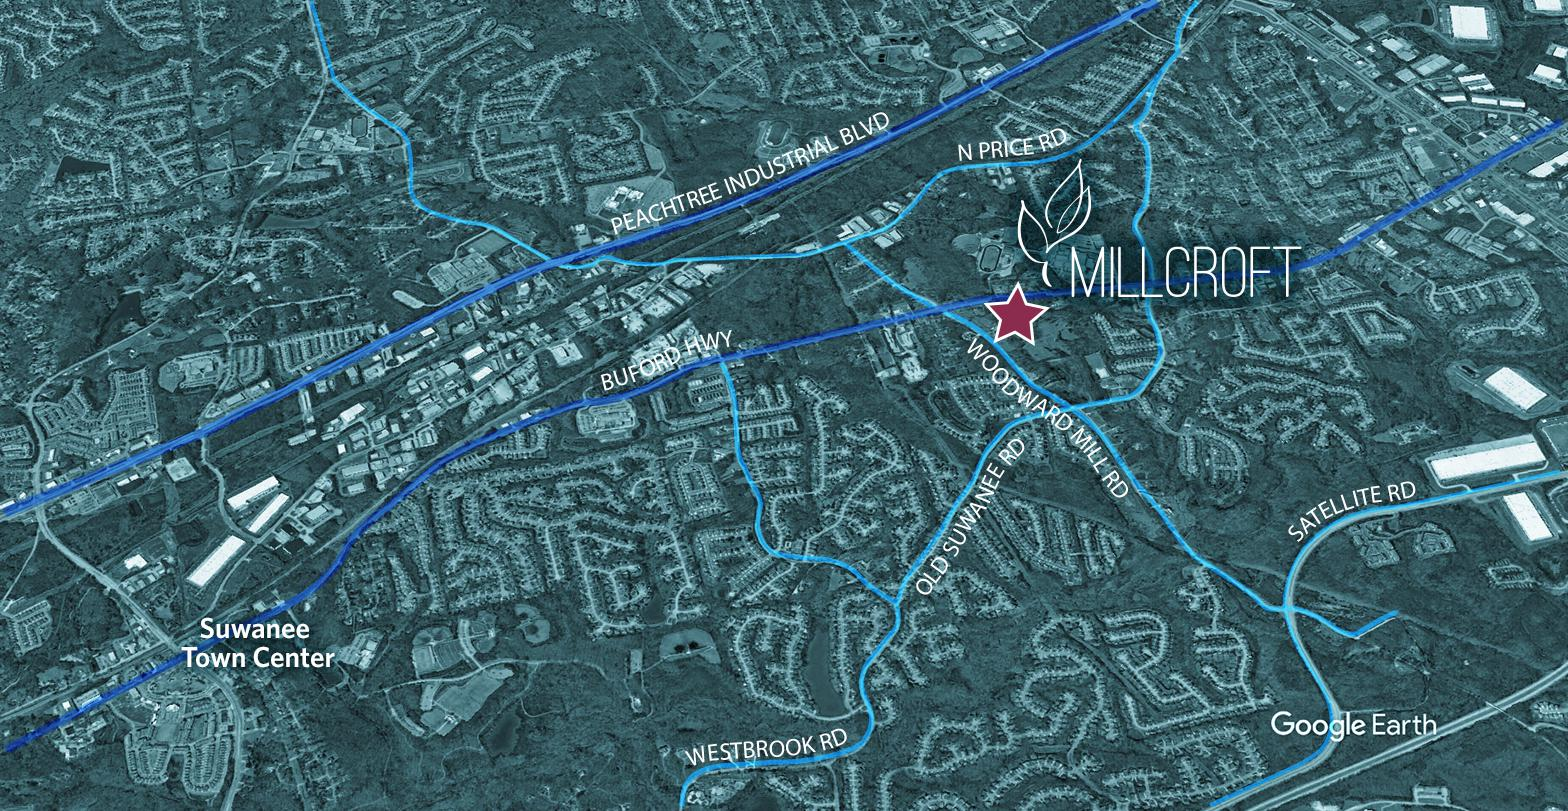 Millcroft New Homes in Sugar Hill GA